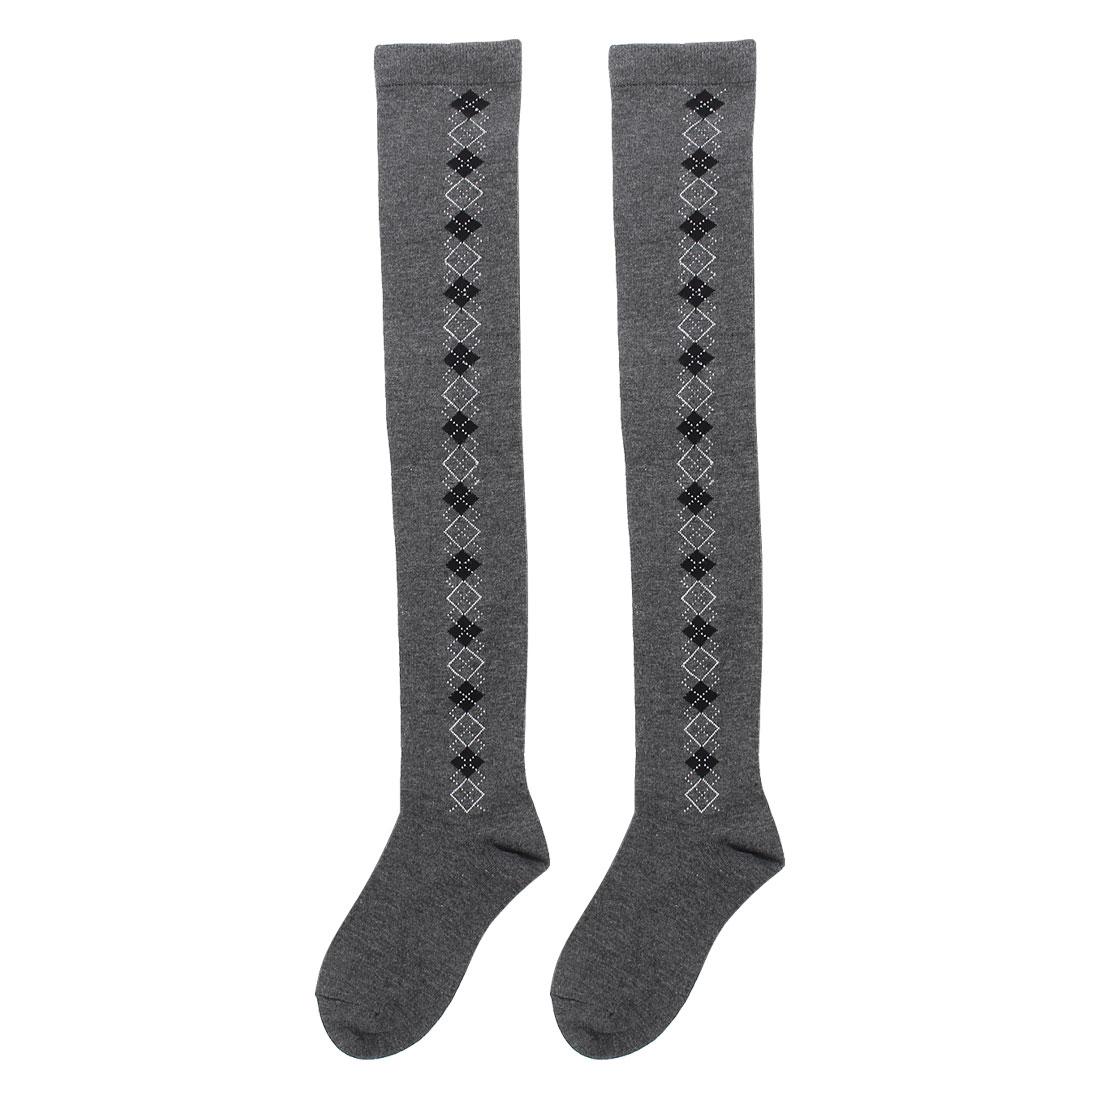 Women Argyle Pattern Stretchy Cuffs Knit Socks Pair